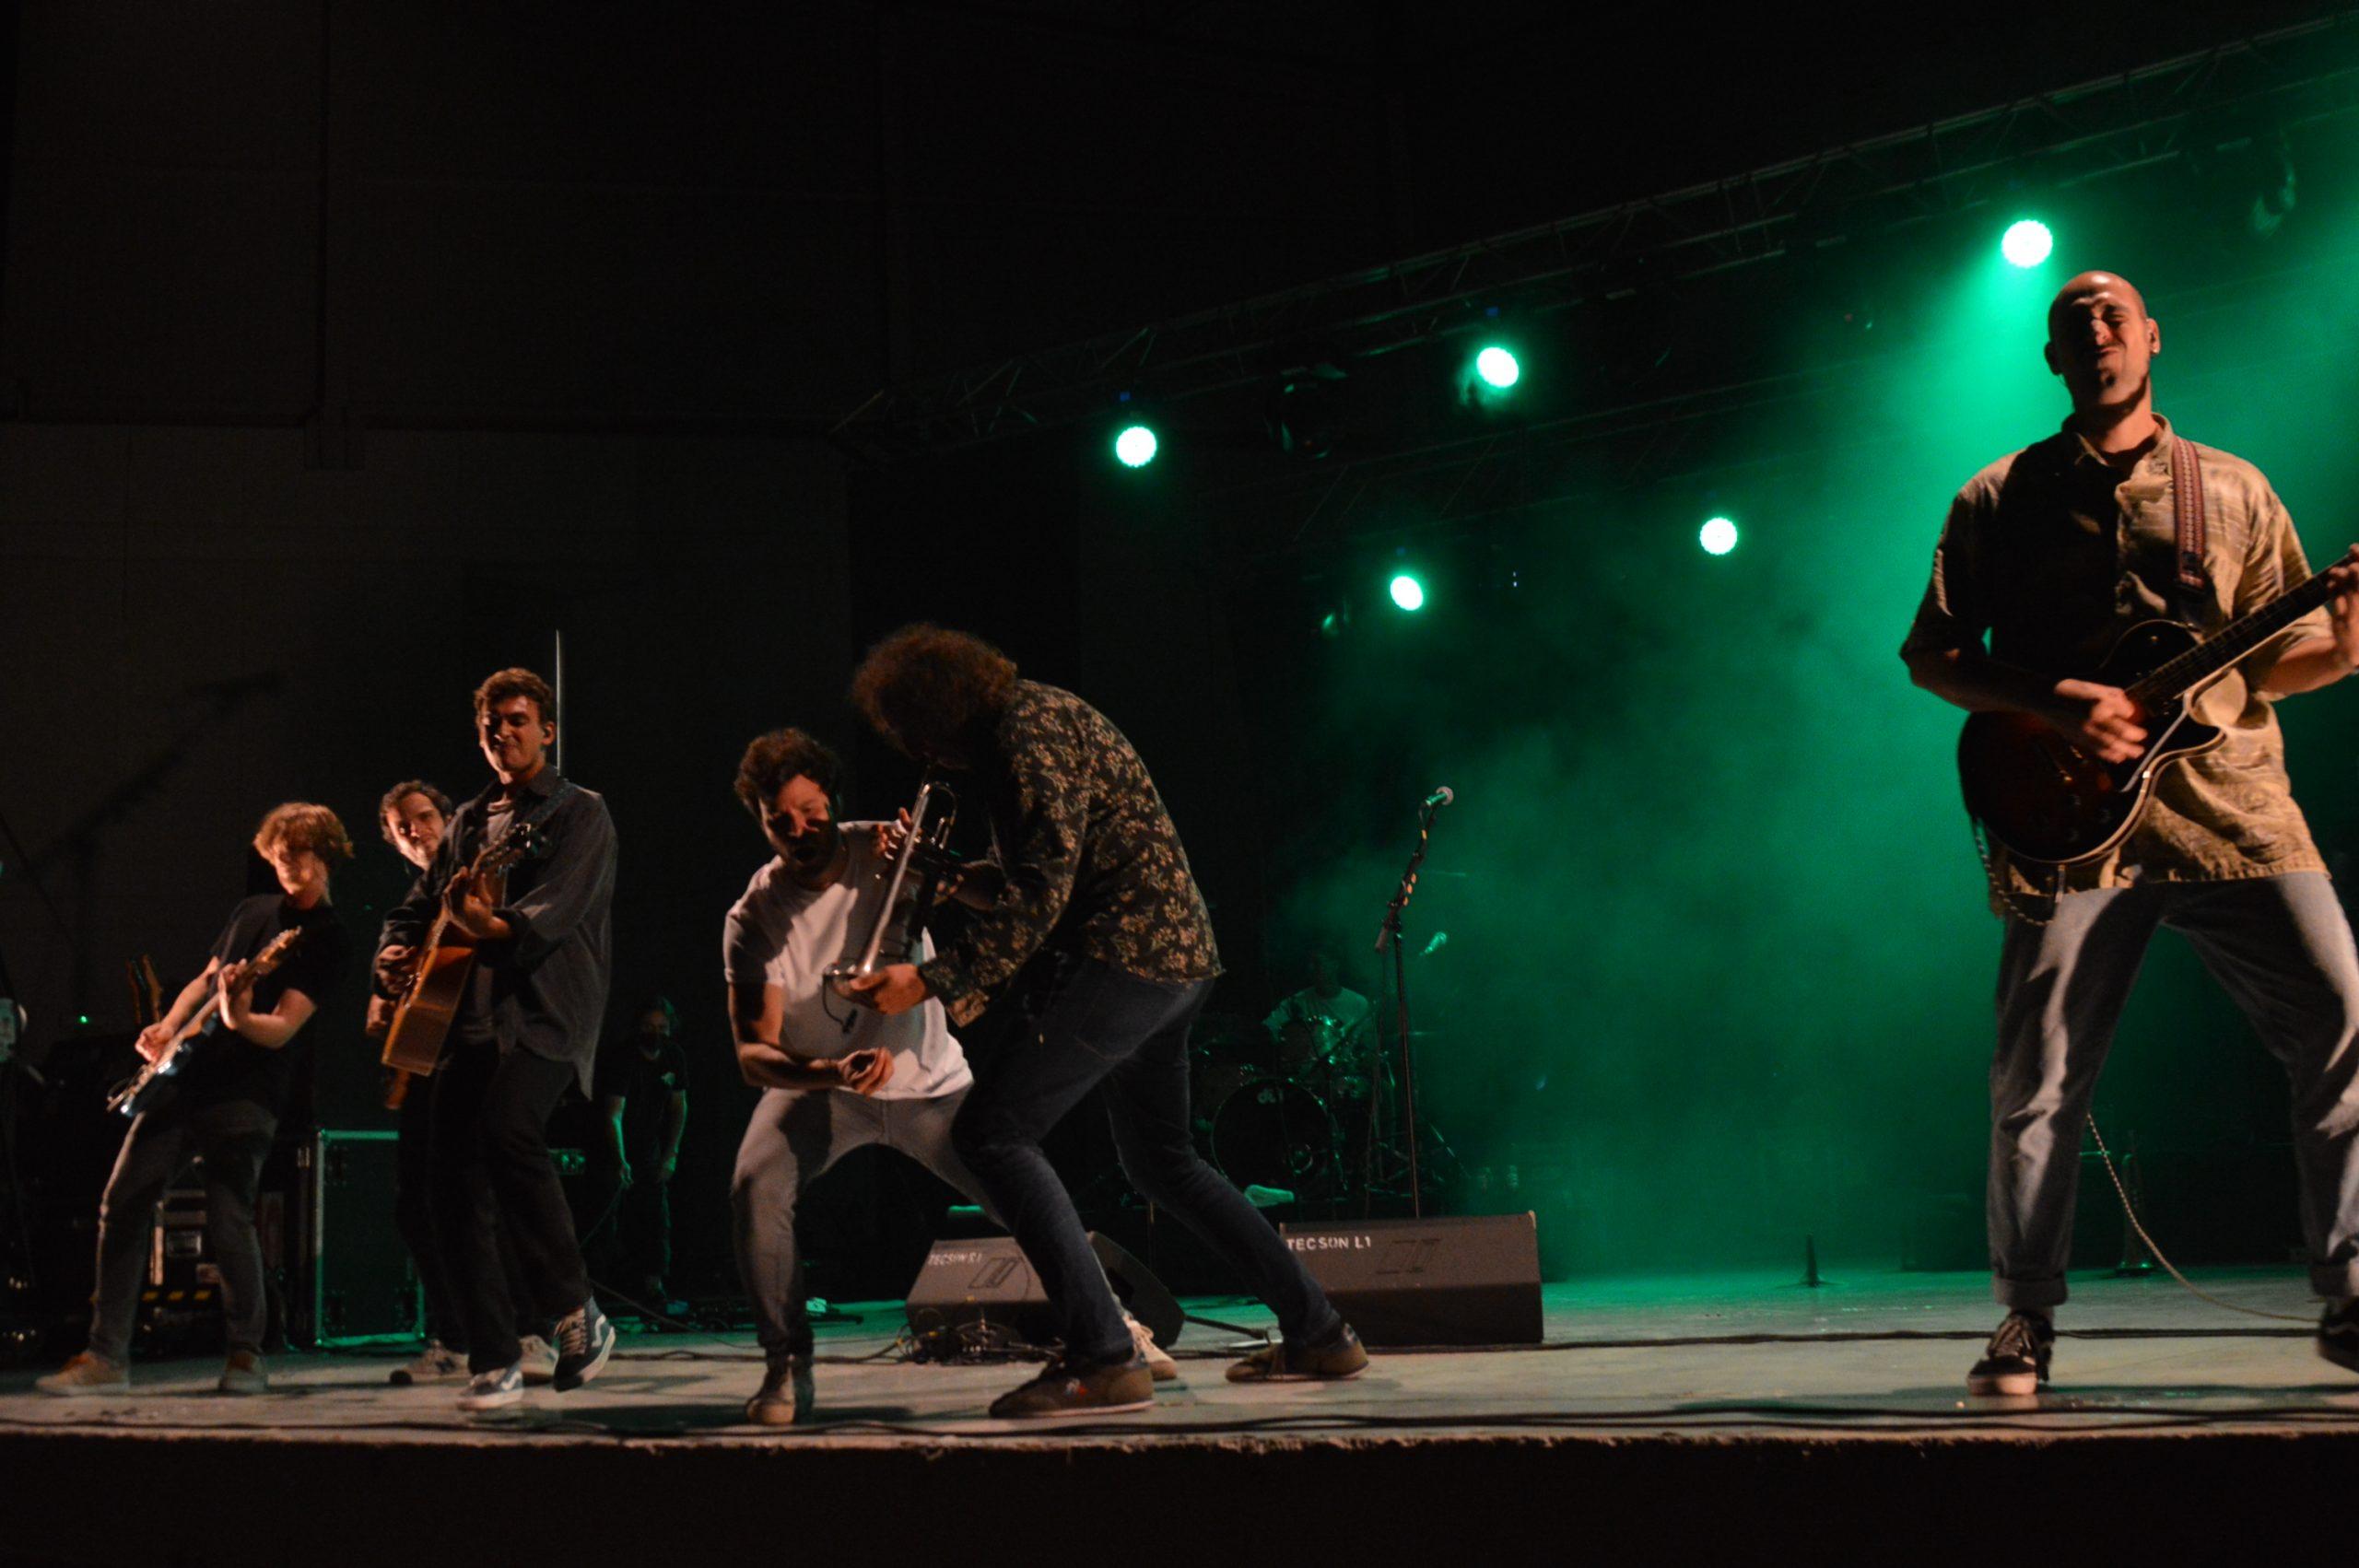 Taburete se entrega a su público en Ponferrada y dan la alternativa al ponferradino Pravlenha 29